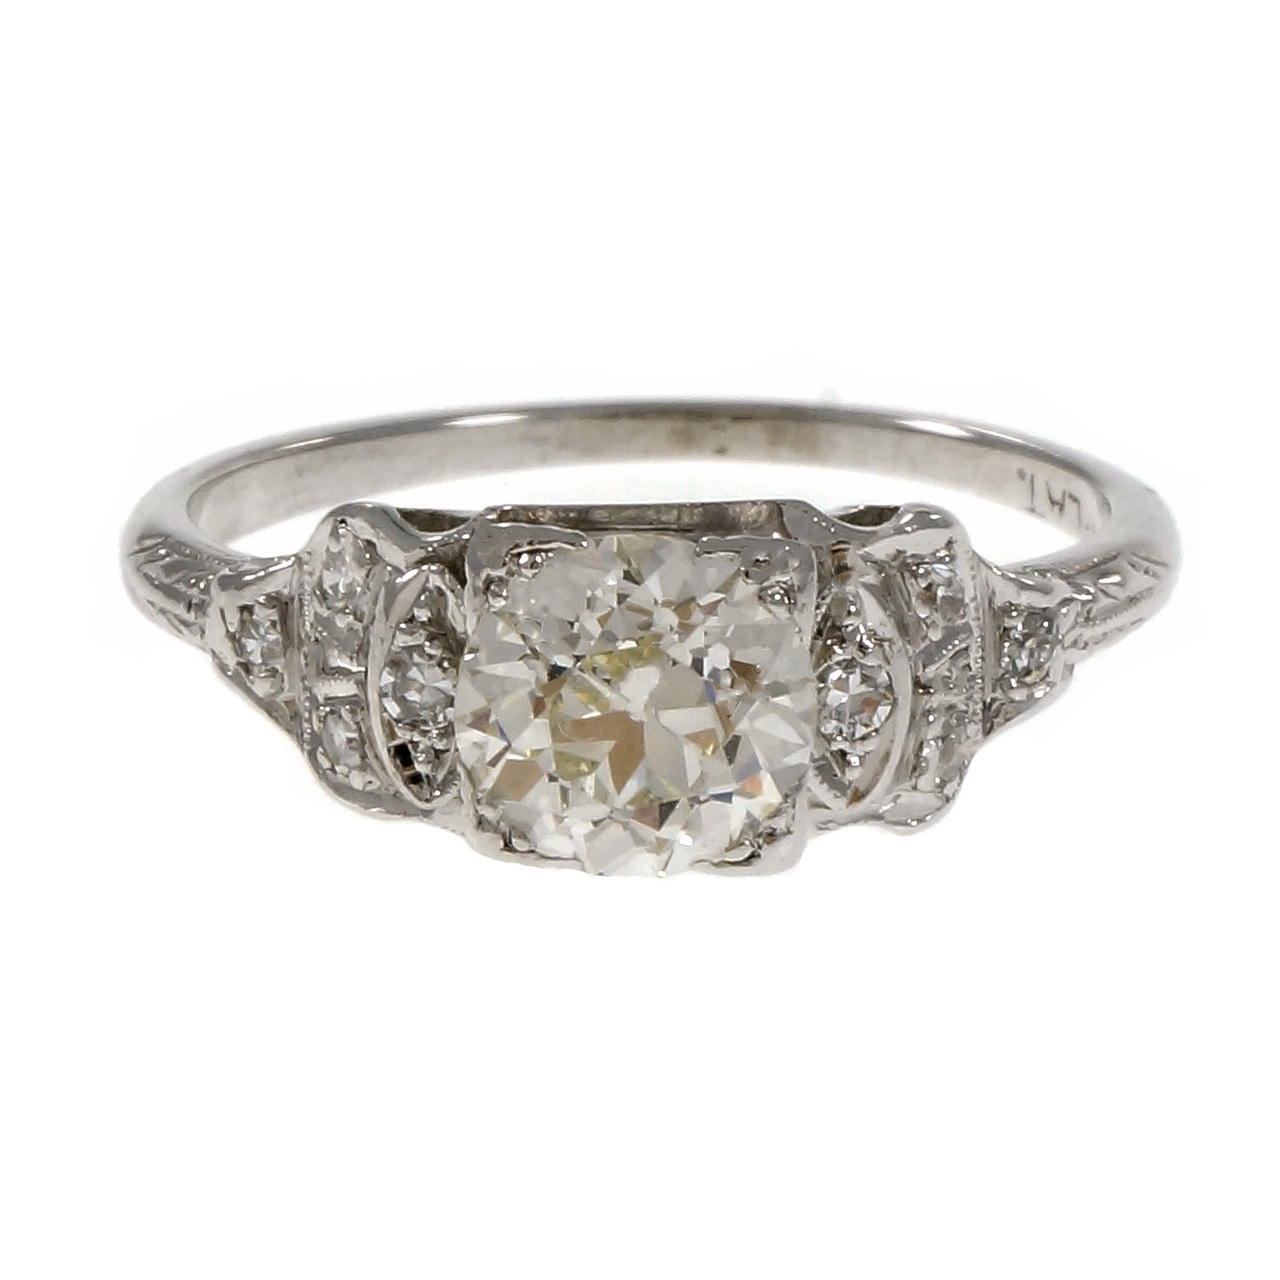 Antique Engagement Ring .20ct Old European Cut Diamond Antique Engagement Ring Art Deco Engagement Vintage Engagement Ring 9k White Gold